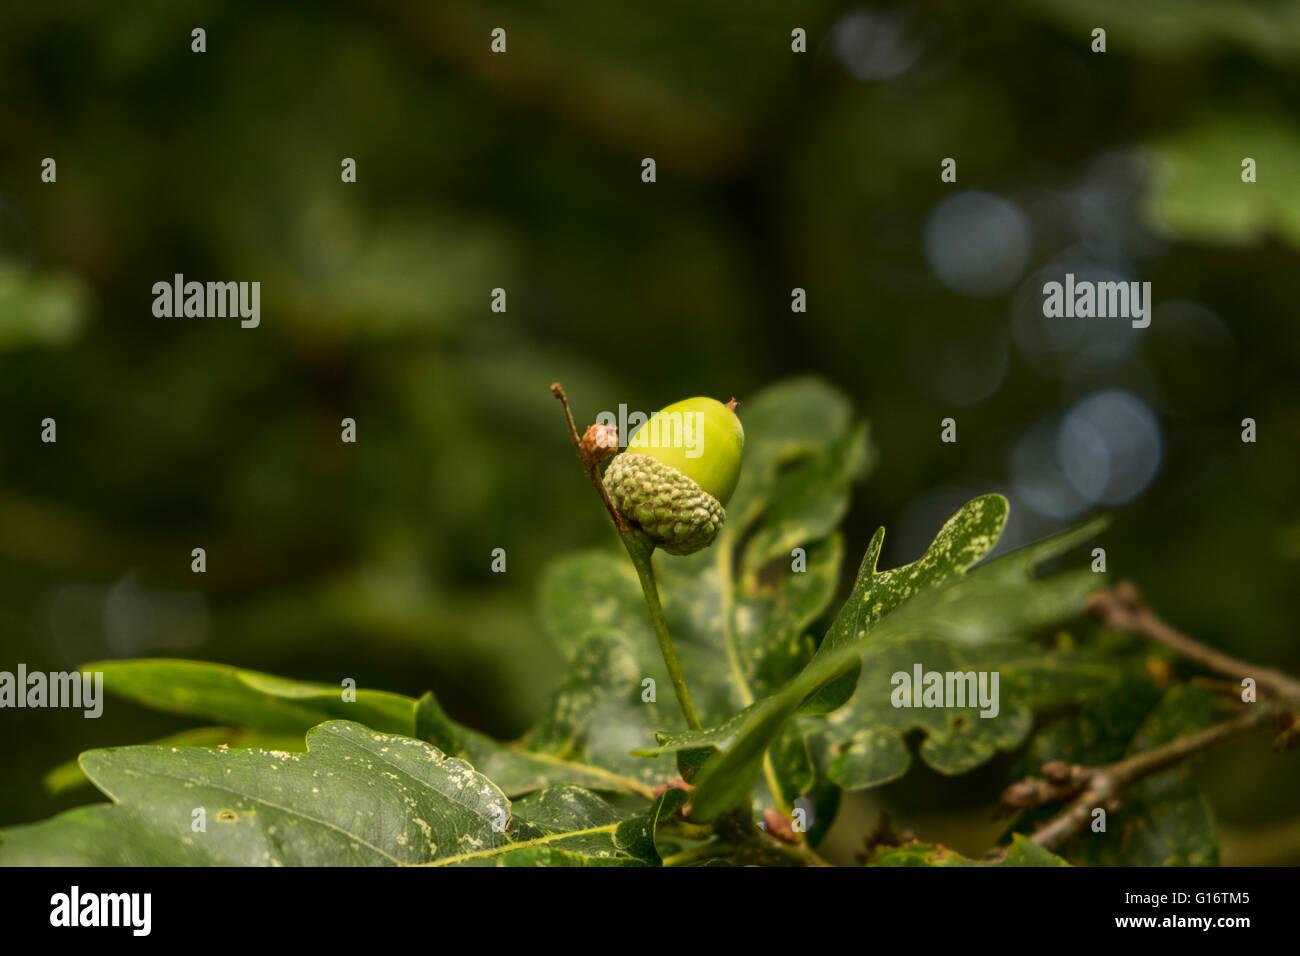 Small Acorns Stock Photos & Small Acorns Stock Images - Alamy